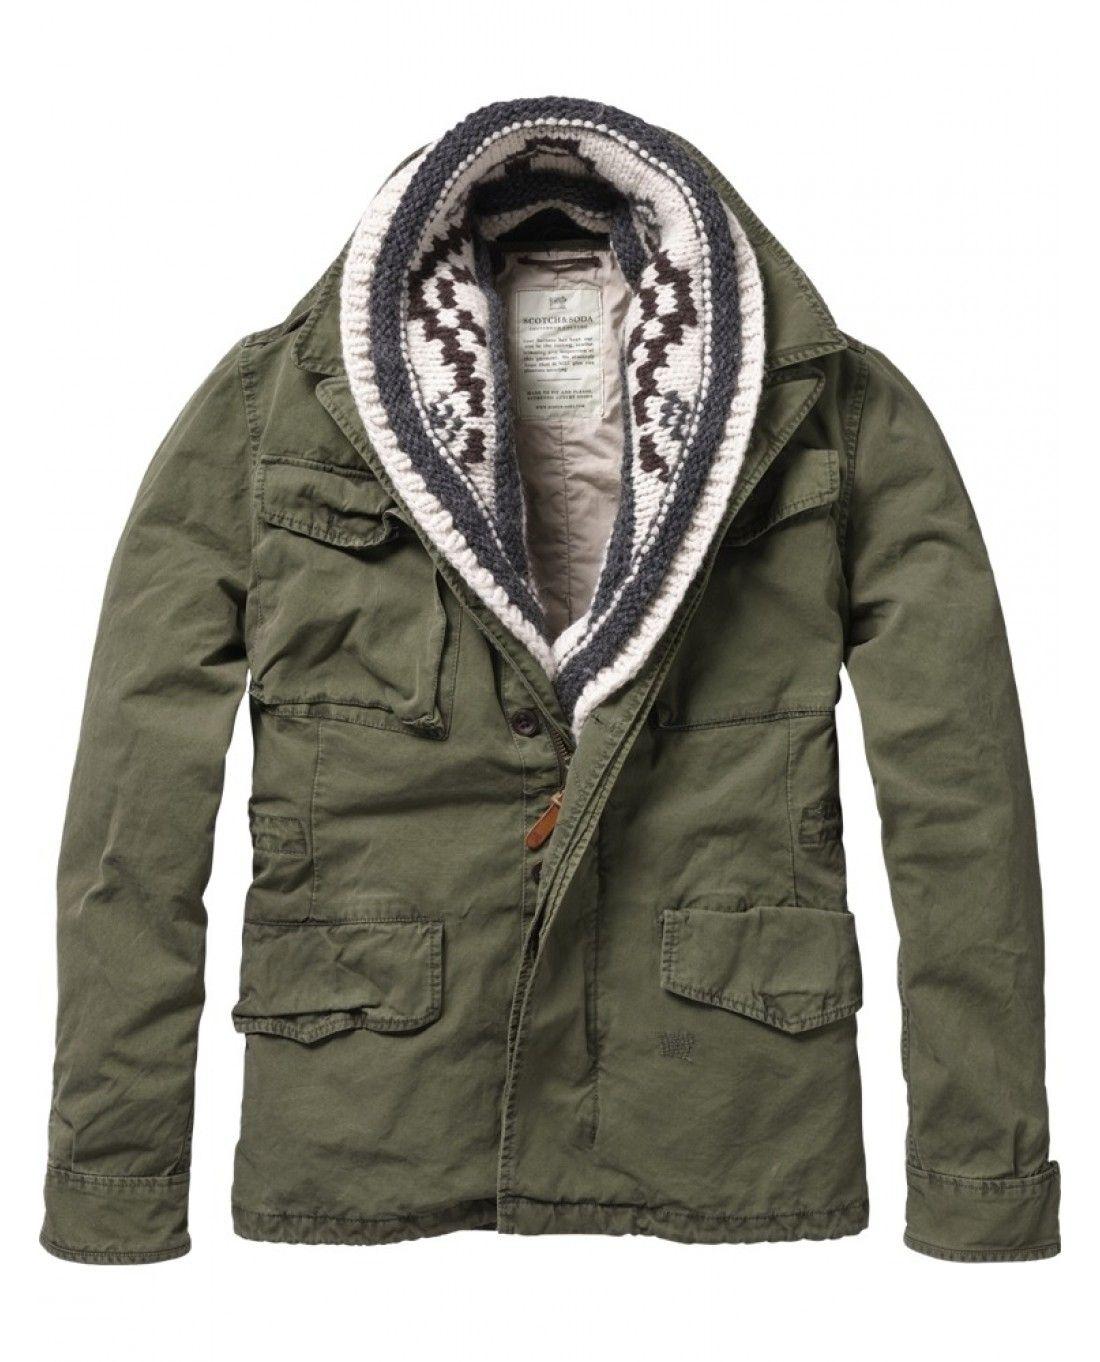 midlength military jacket jackets scotch soda online. Black Bedroom Furniture Sets. Home Design Ideas